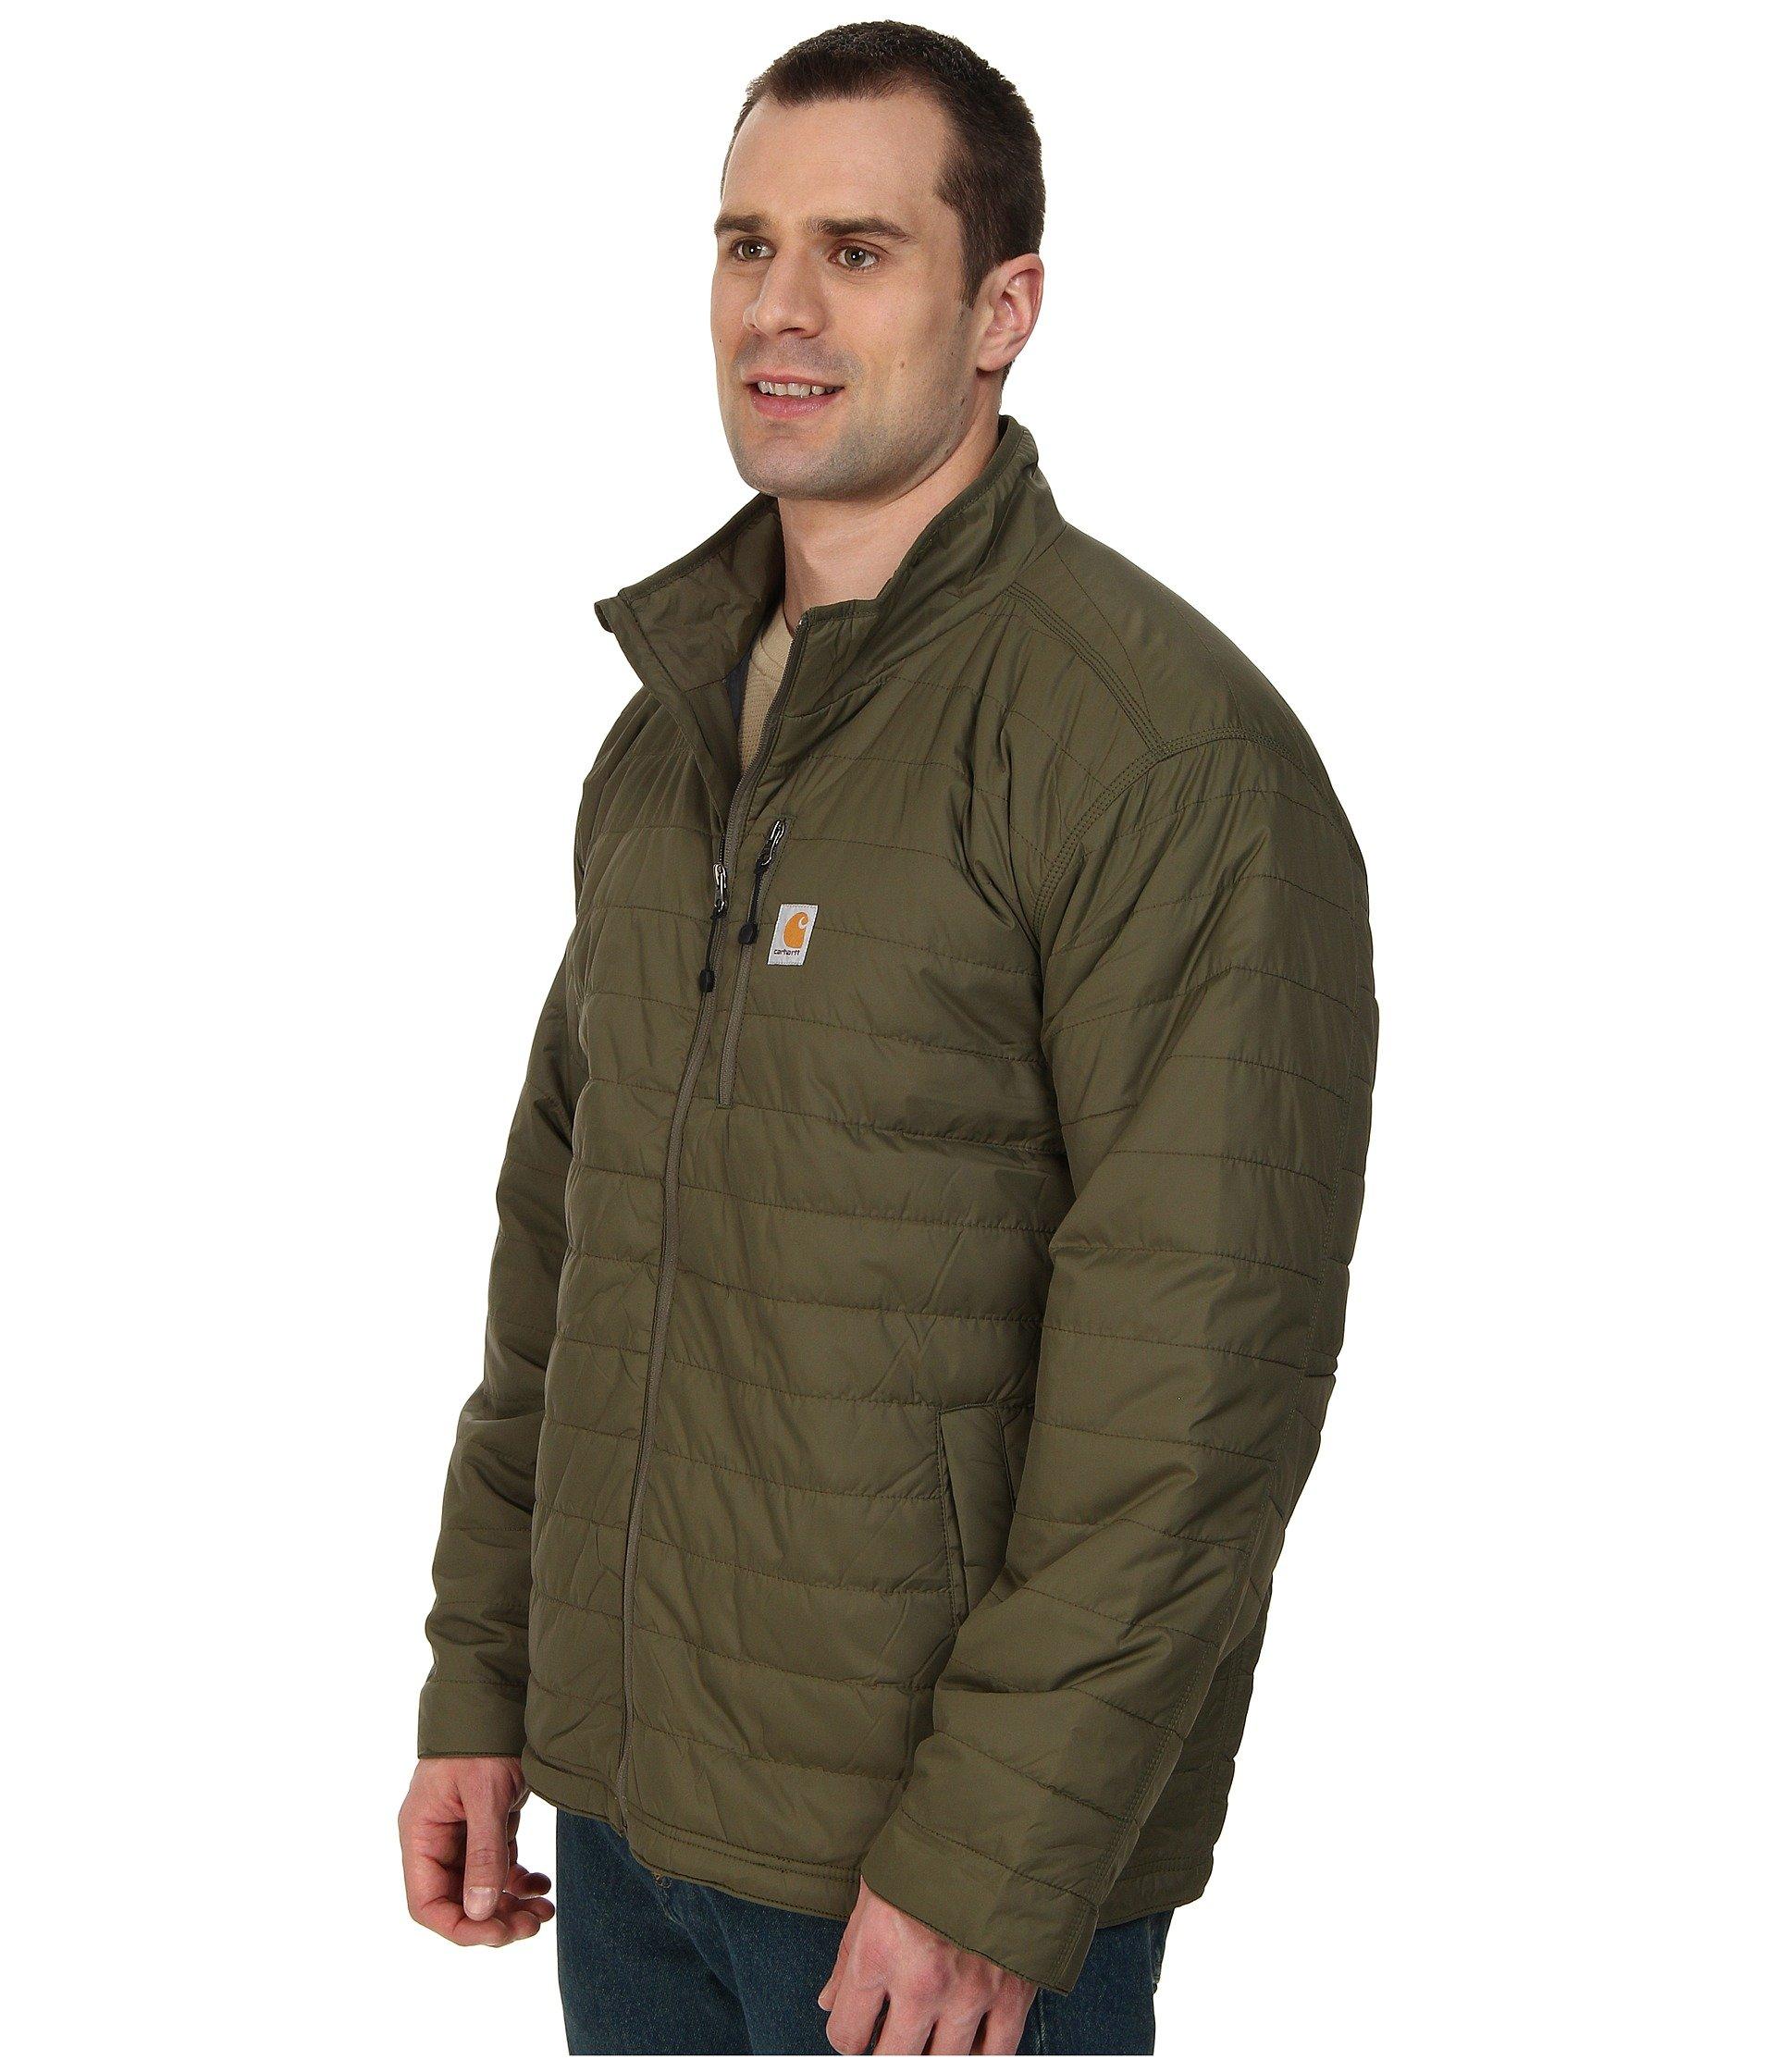 Carhartt Big & Tall Gilliam Jacket in Green for Men | Lyst